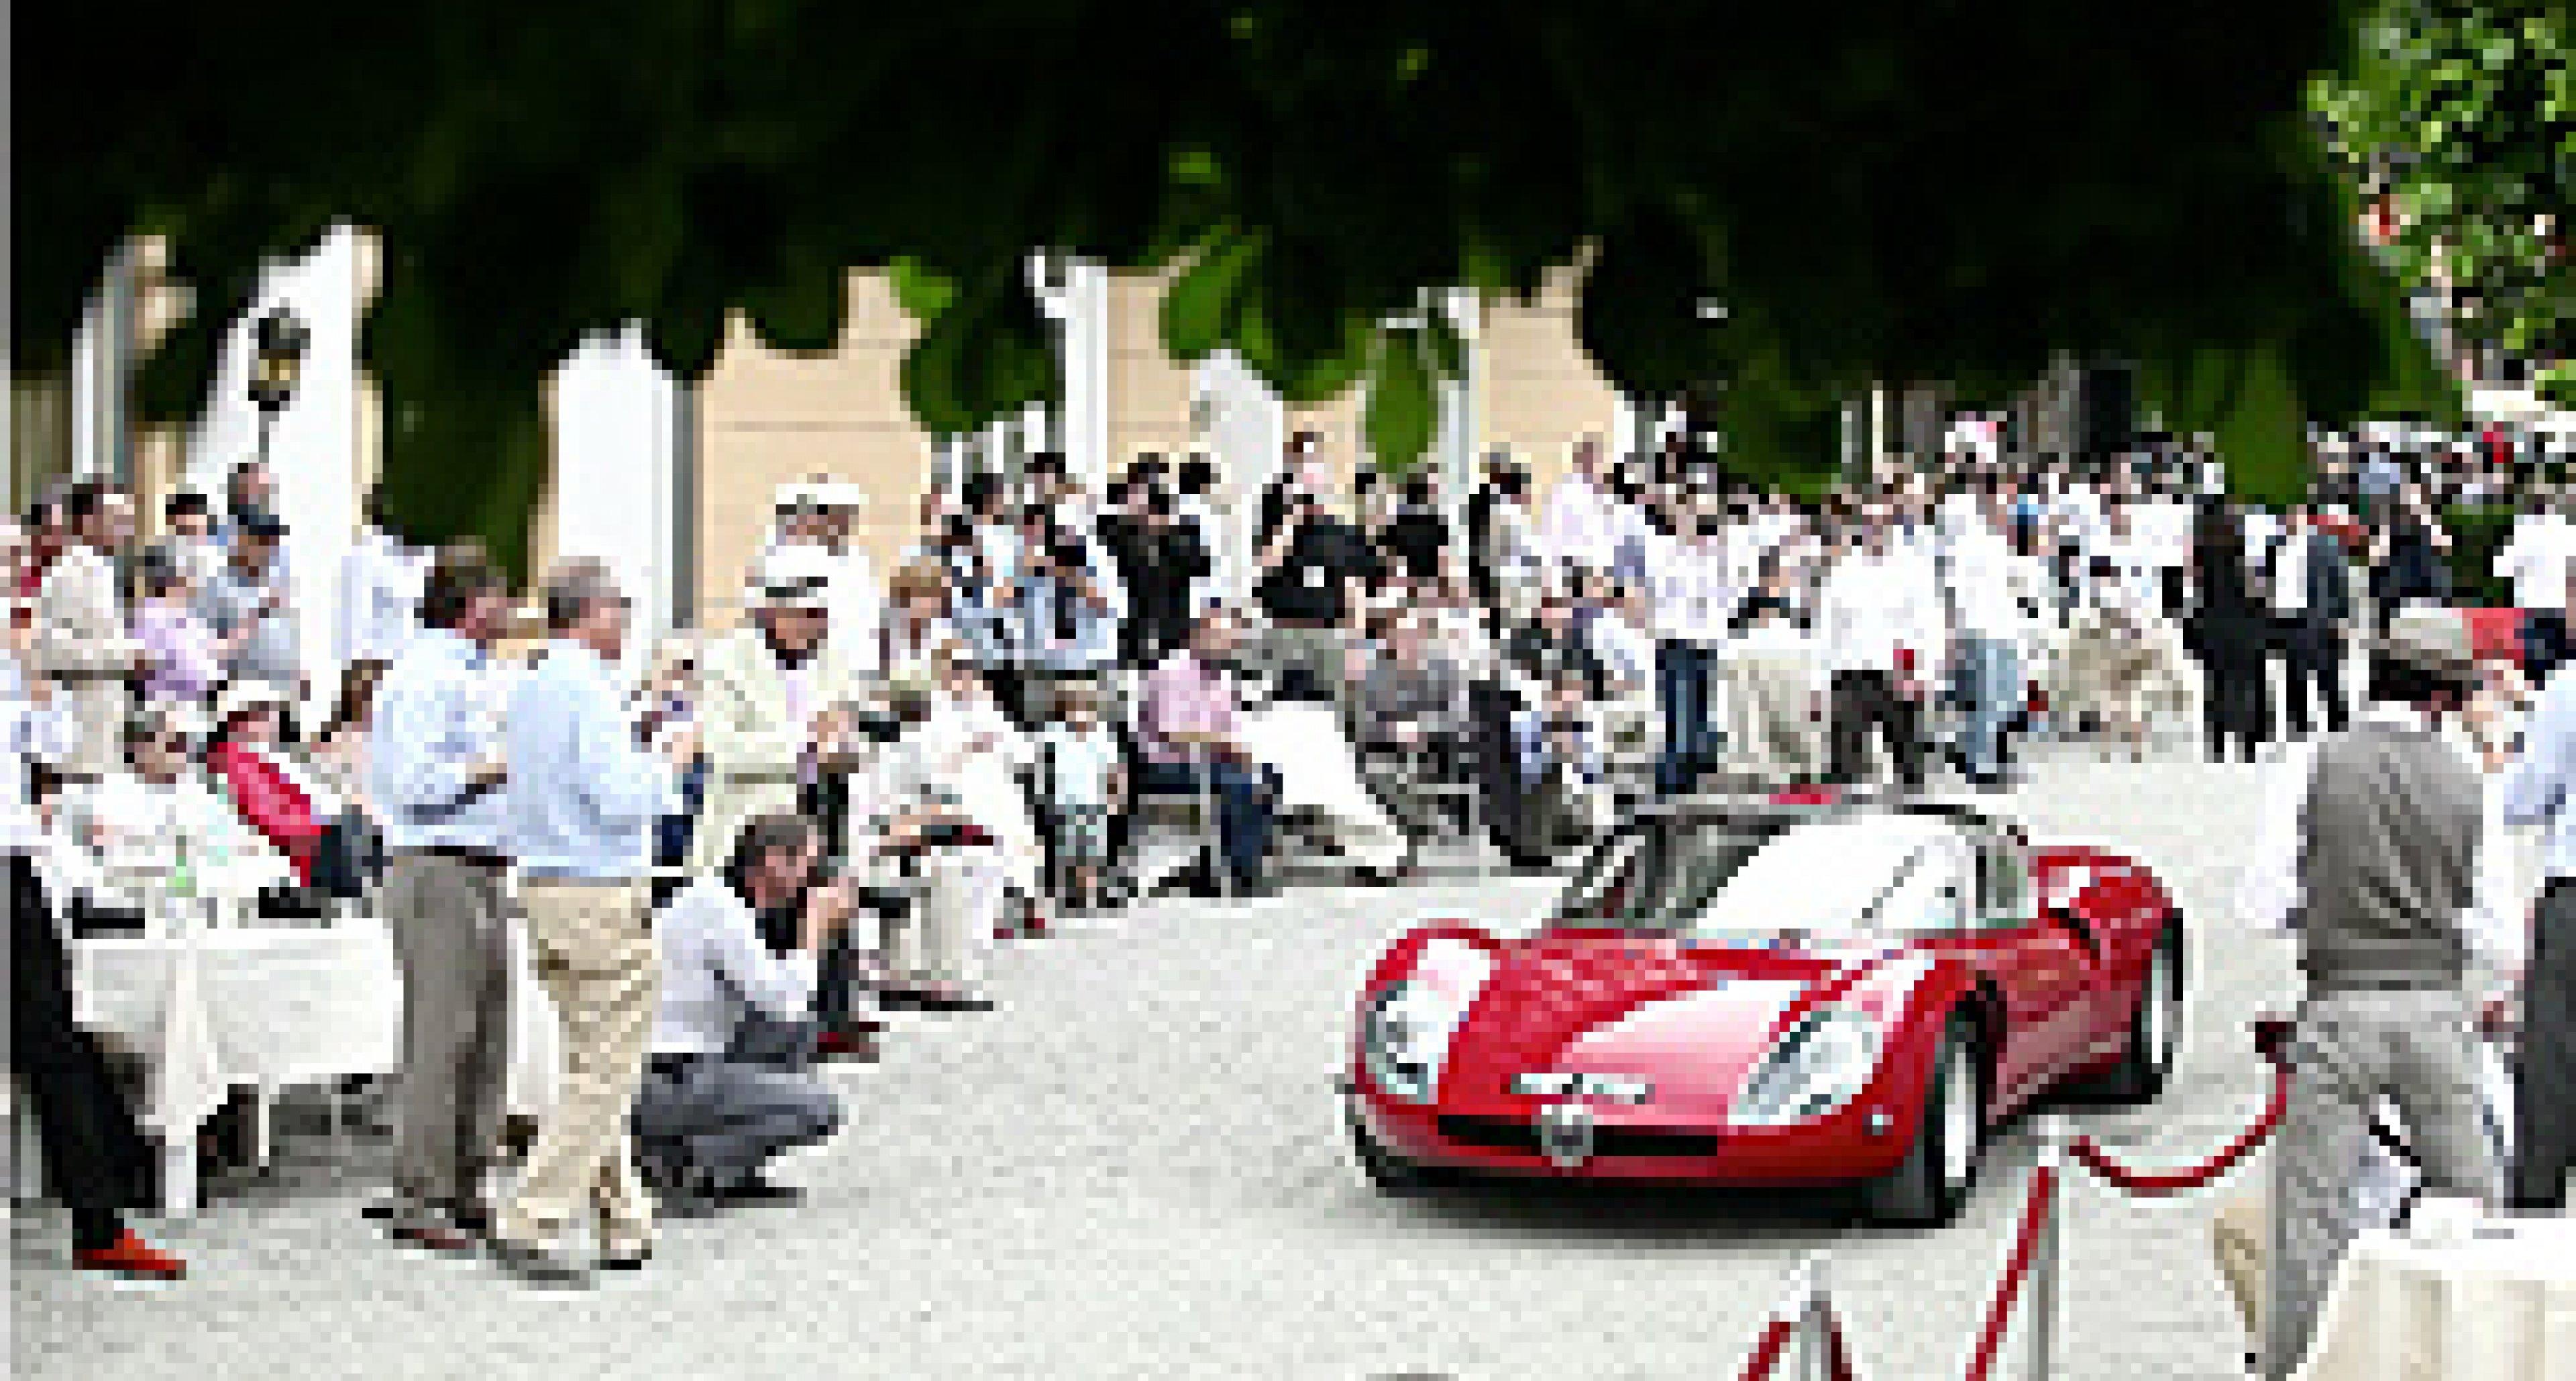 2011 Villa d'Este Concours d'Elegance: First impressions on video